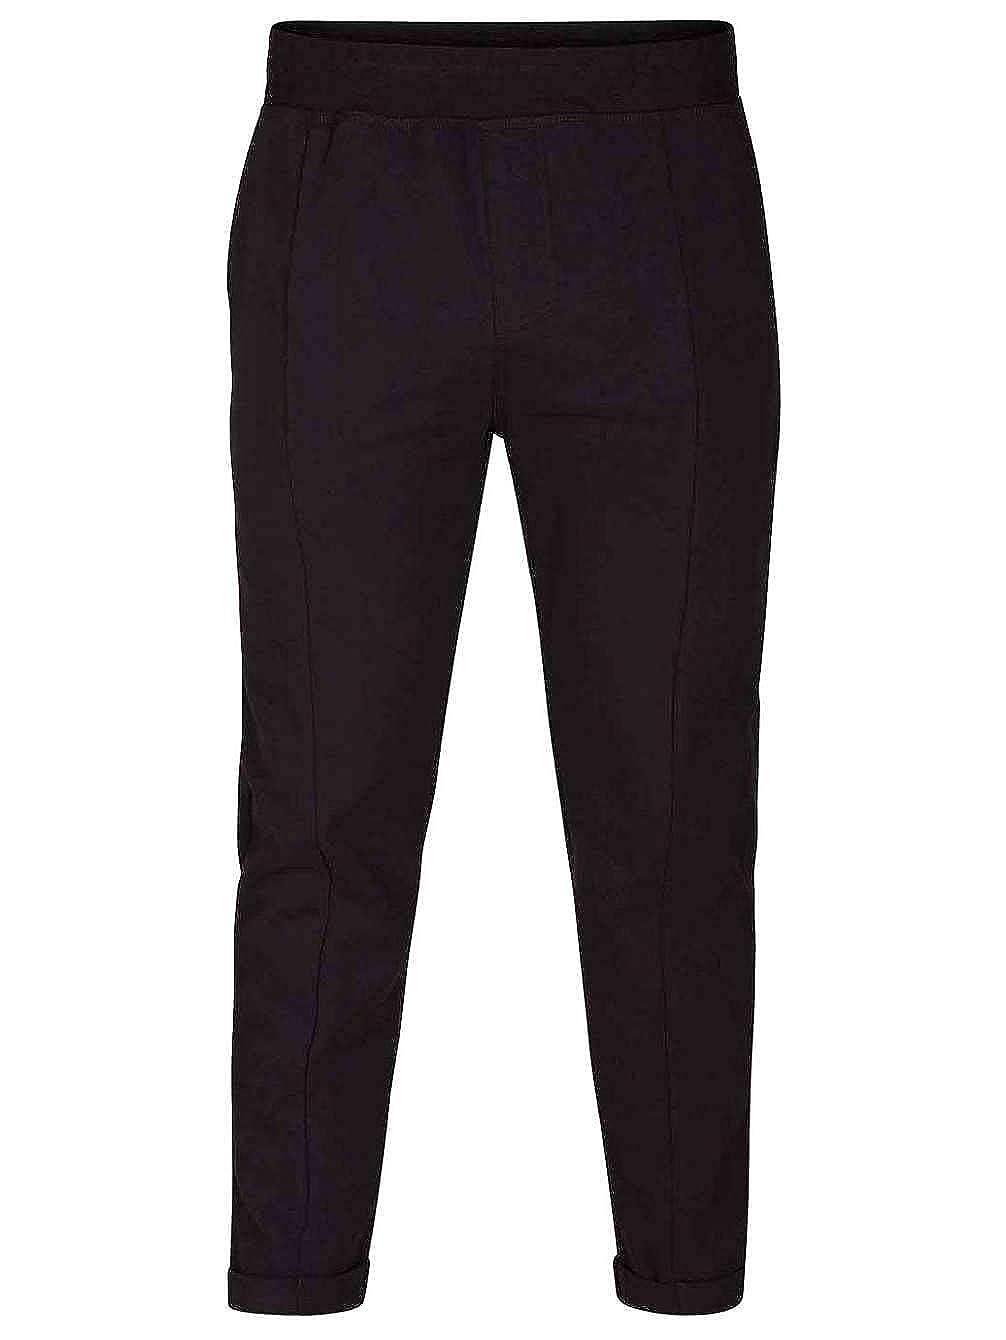 TALLA L. Hurley Atlas Slim - Pantalones Hombre